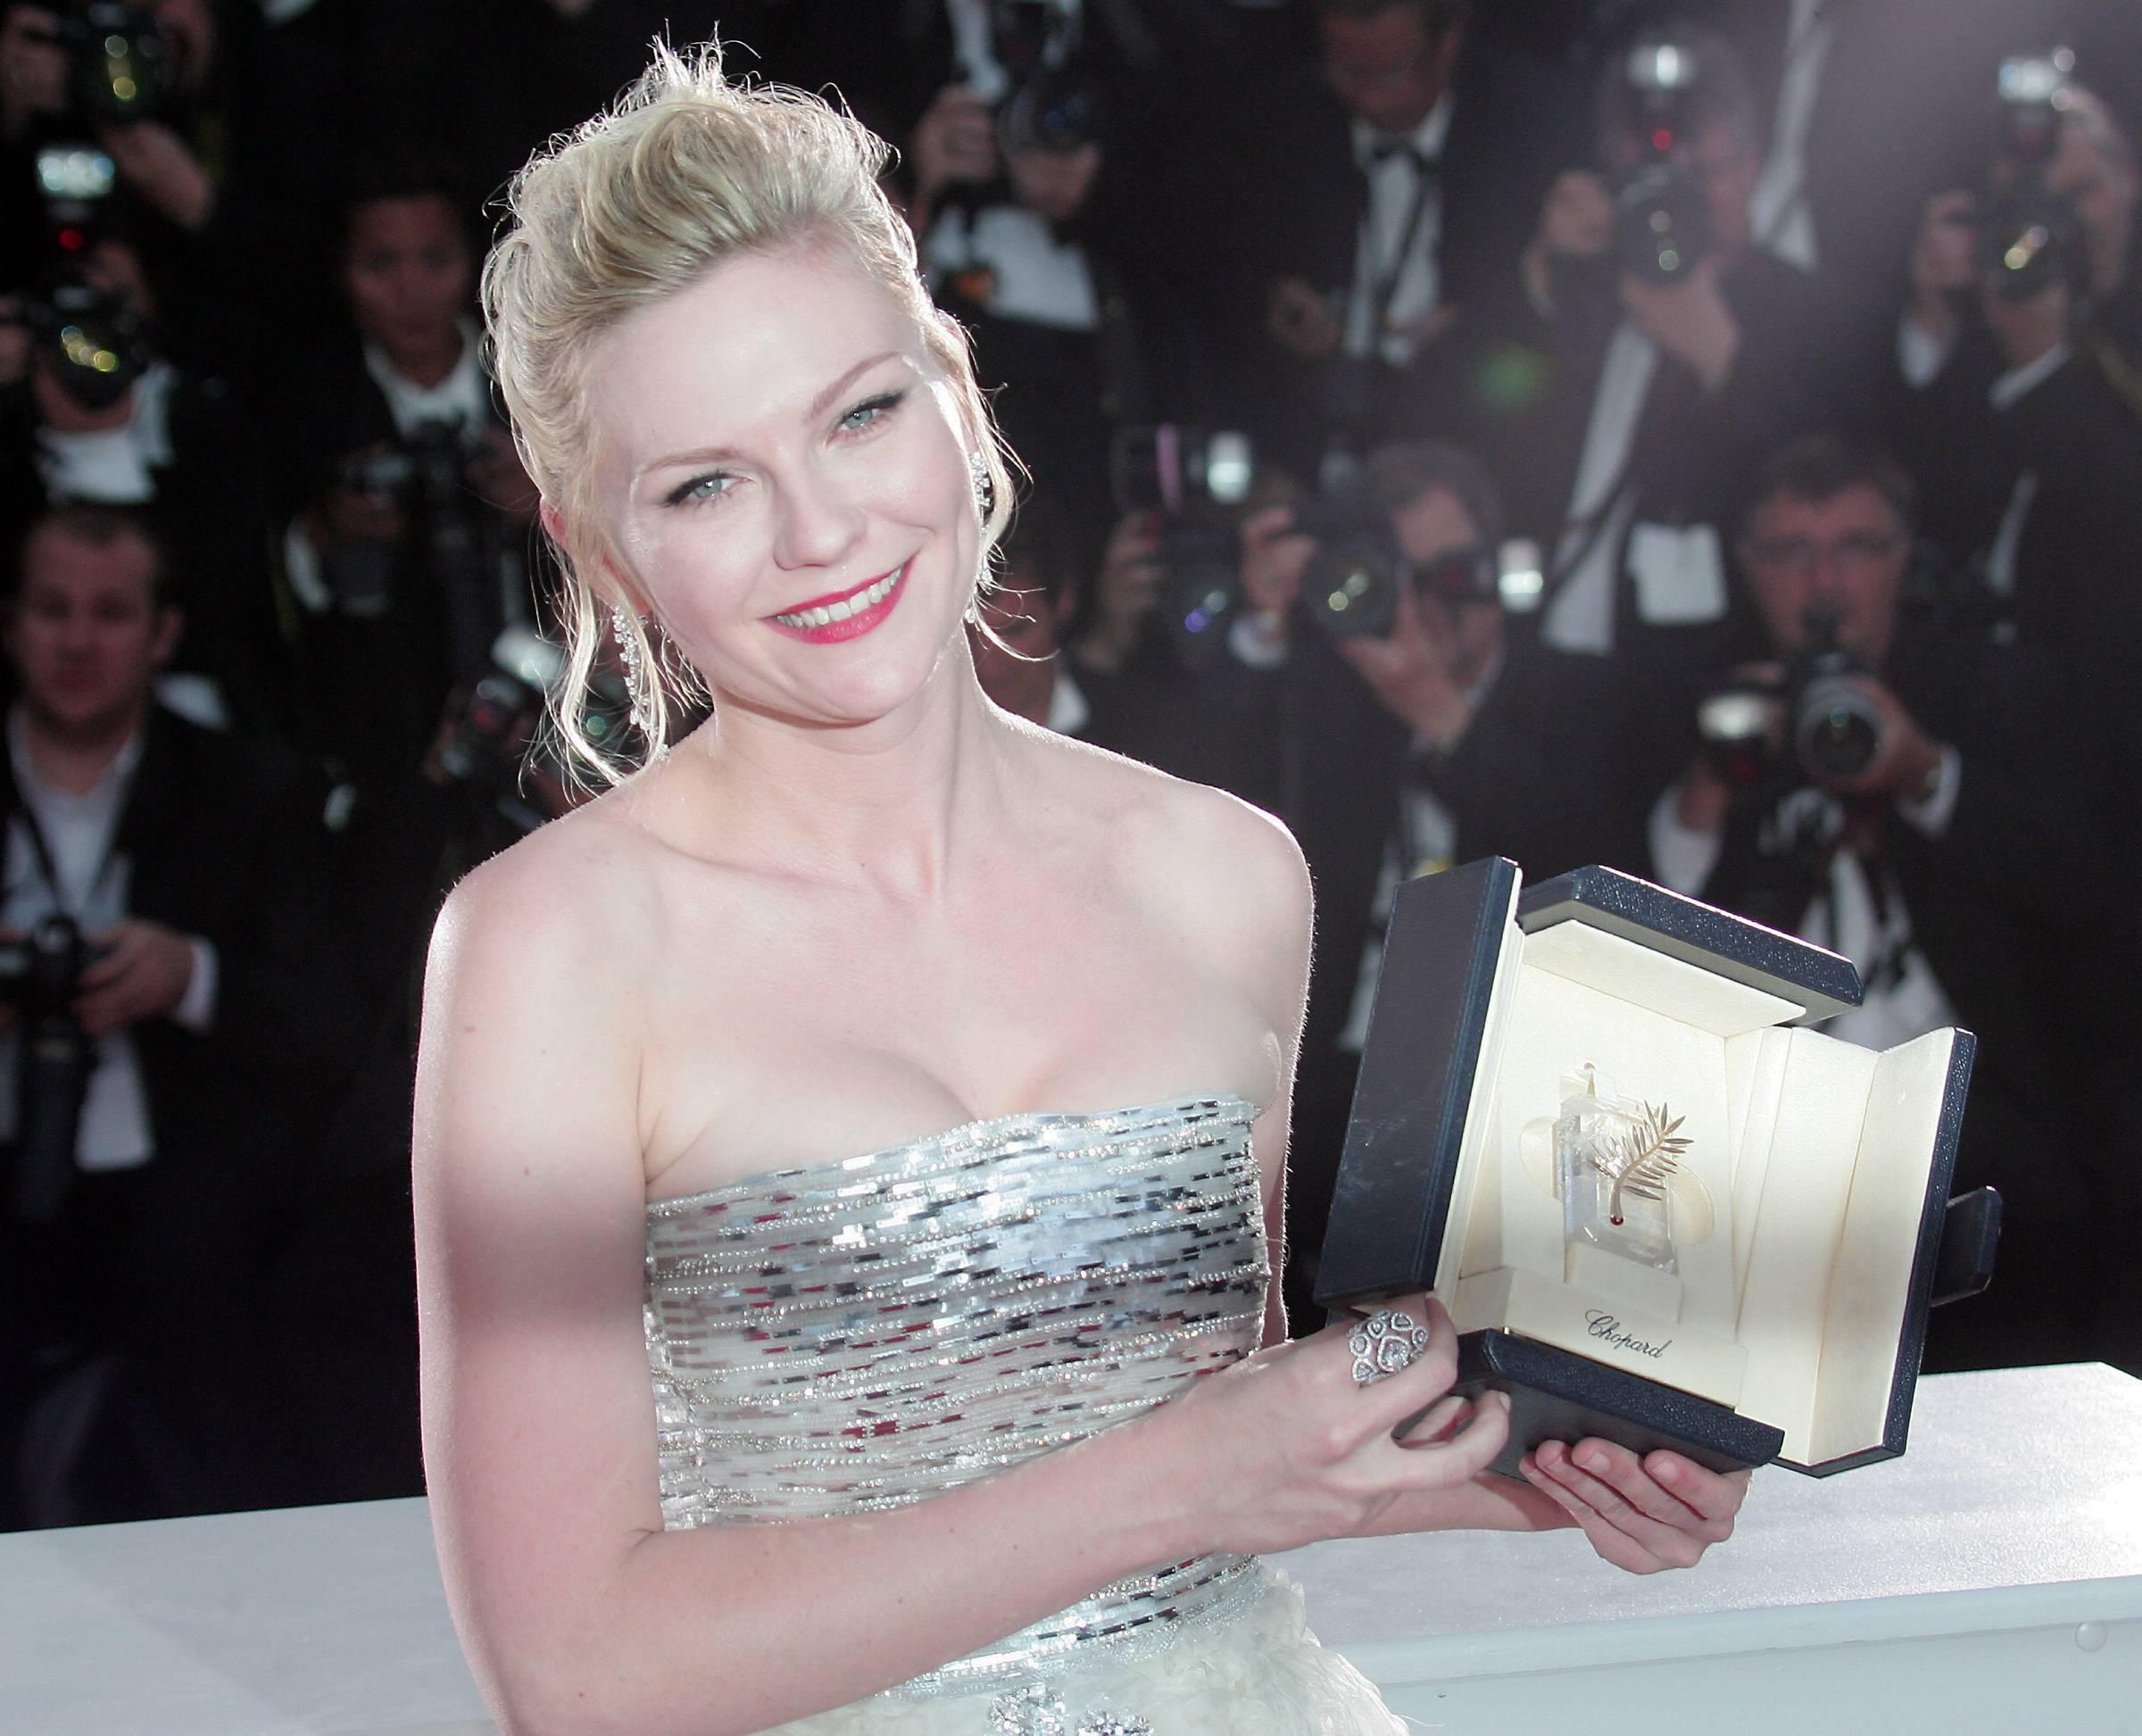 Kirsten Dunst festival de cannes prix d'interprétation féminin 2011